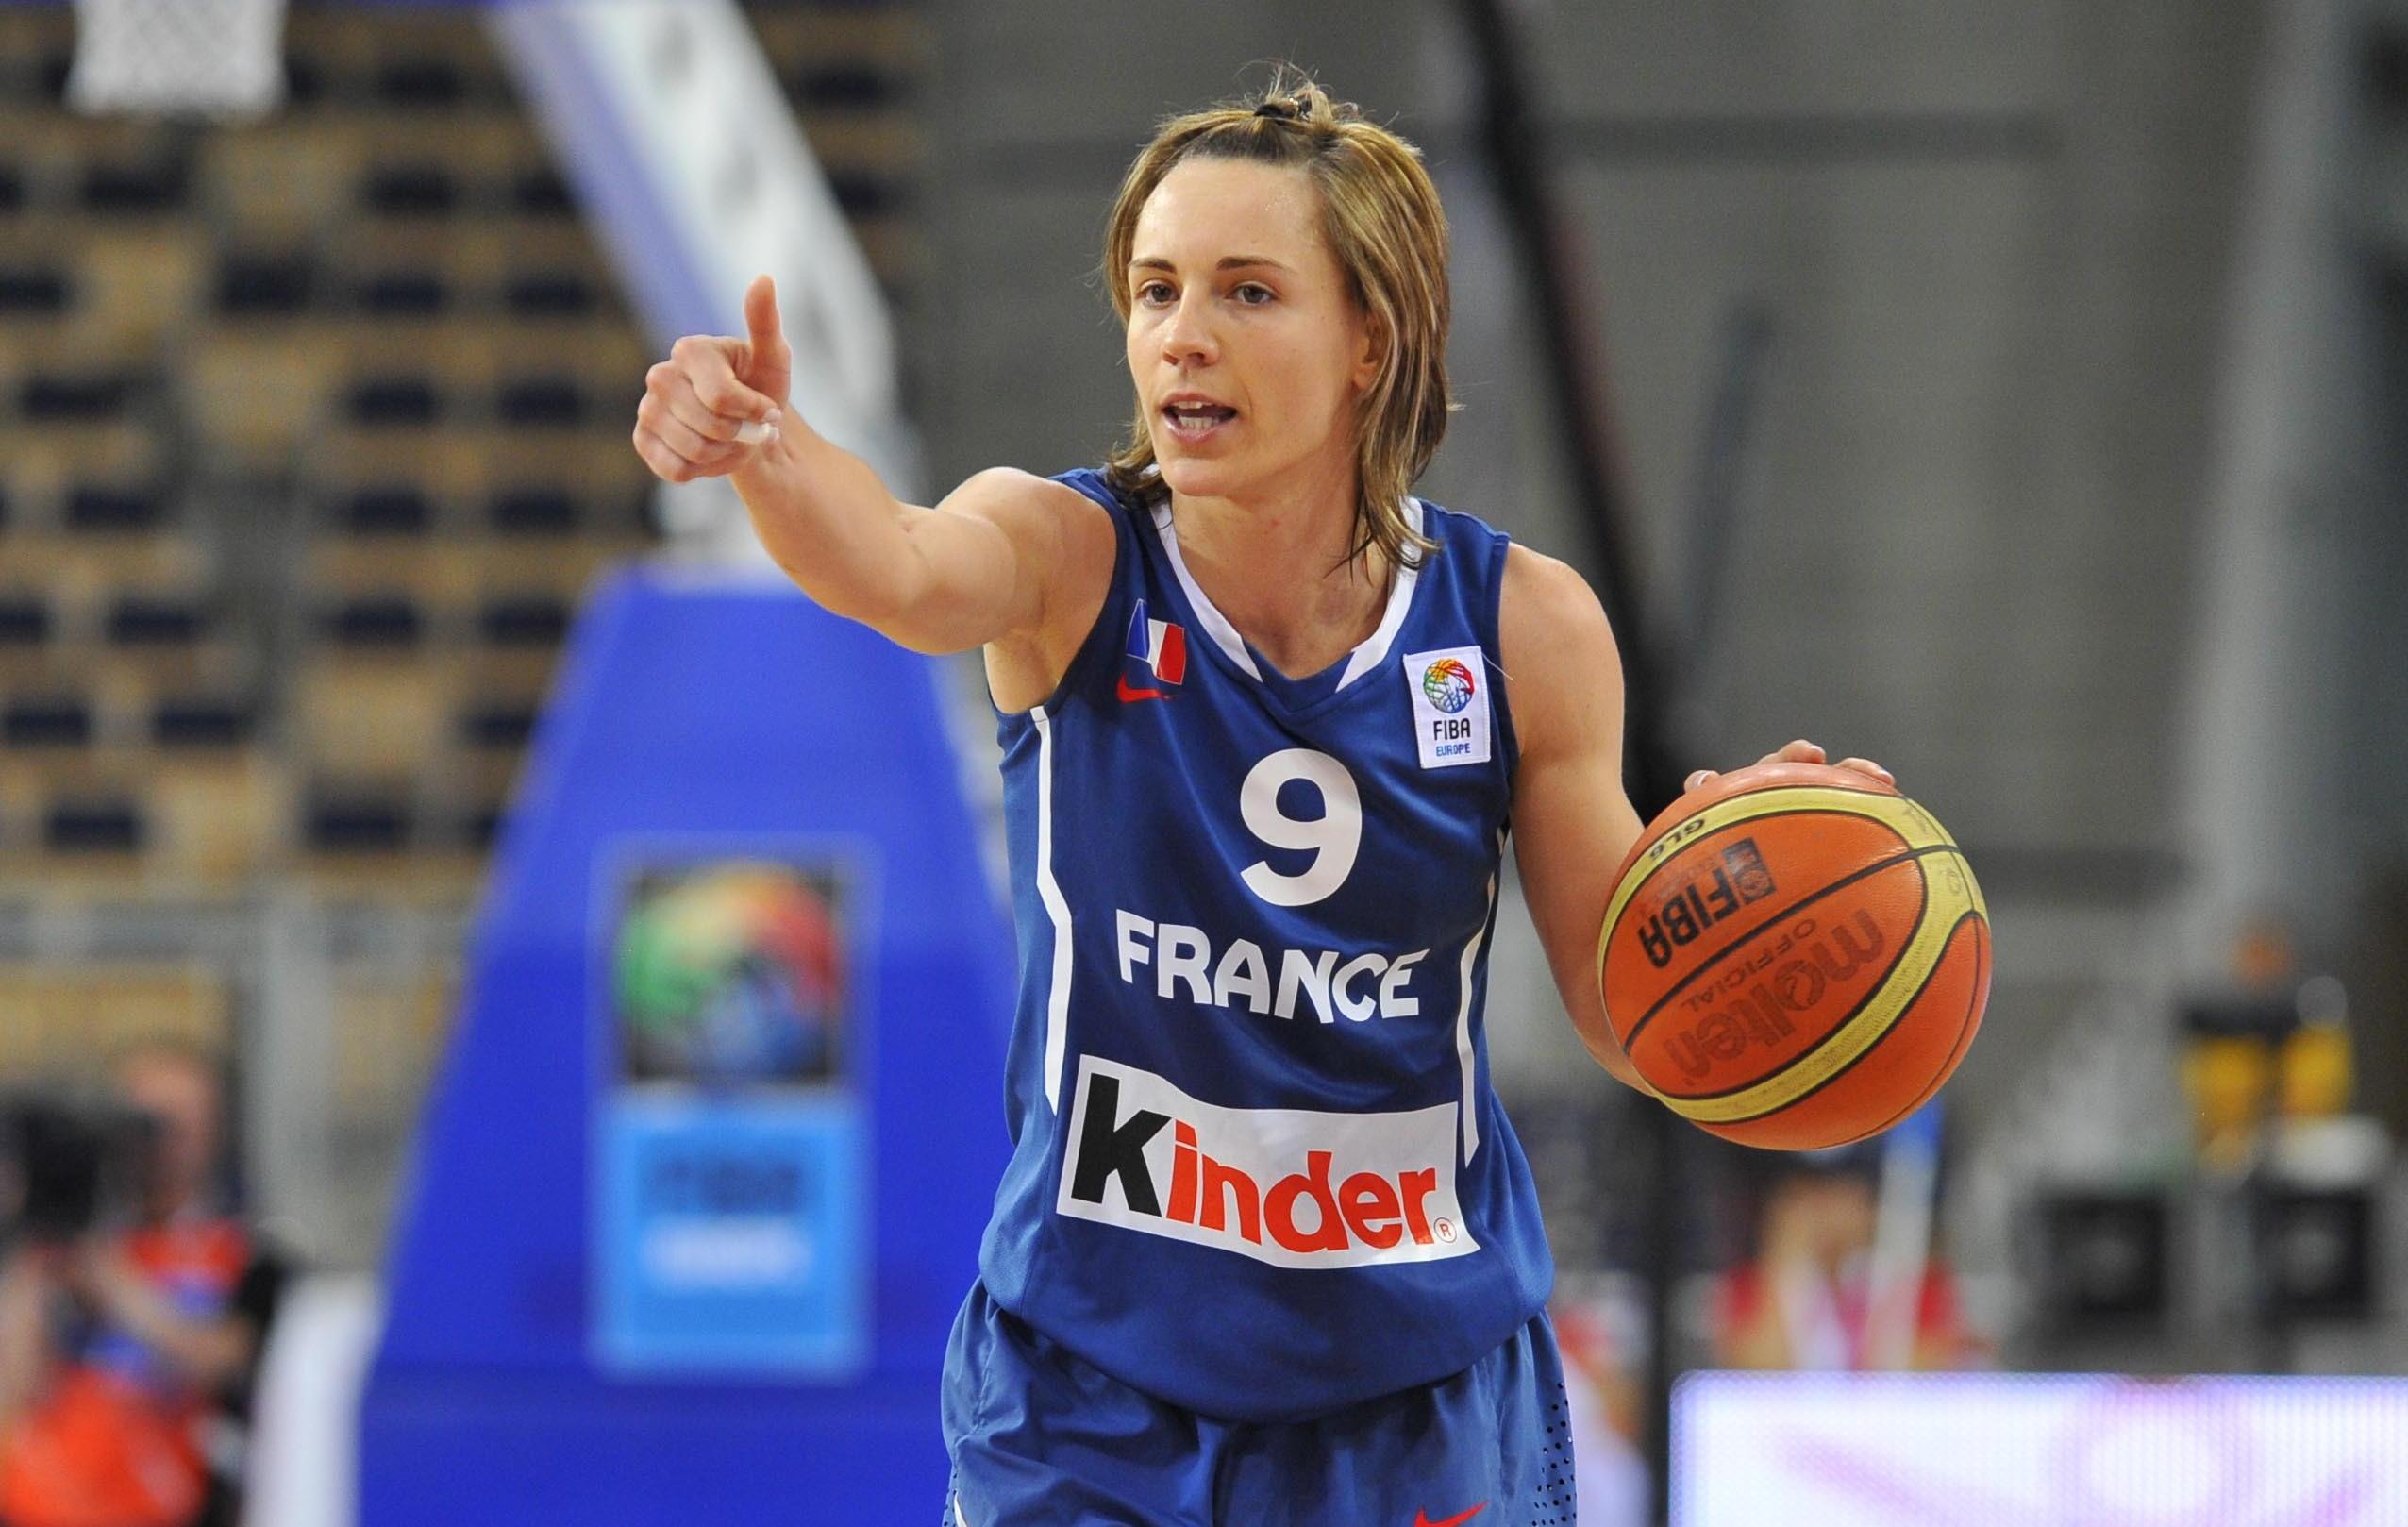 Mondial basket 2014 match france vs usa en direct streaming sur sport d s 20h15 ibuzz365 - Basket feminin coupe de france ...